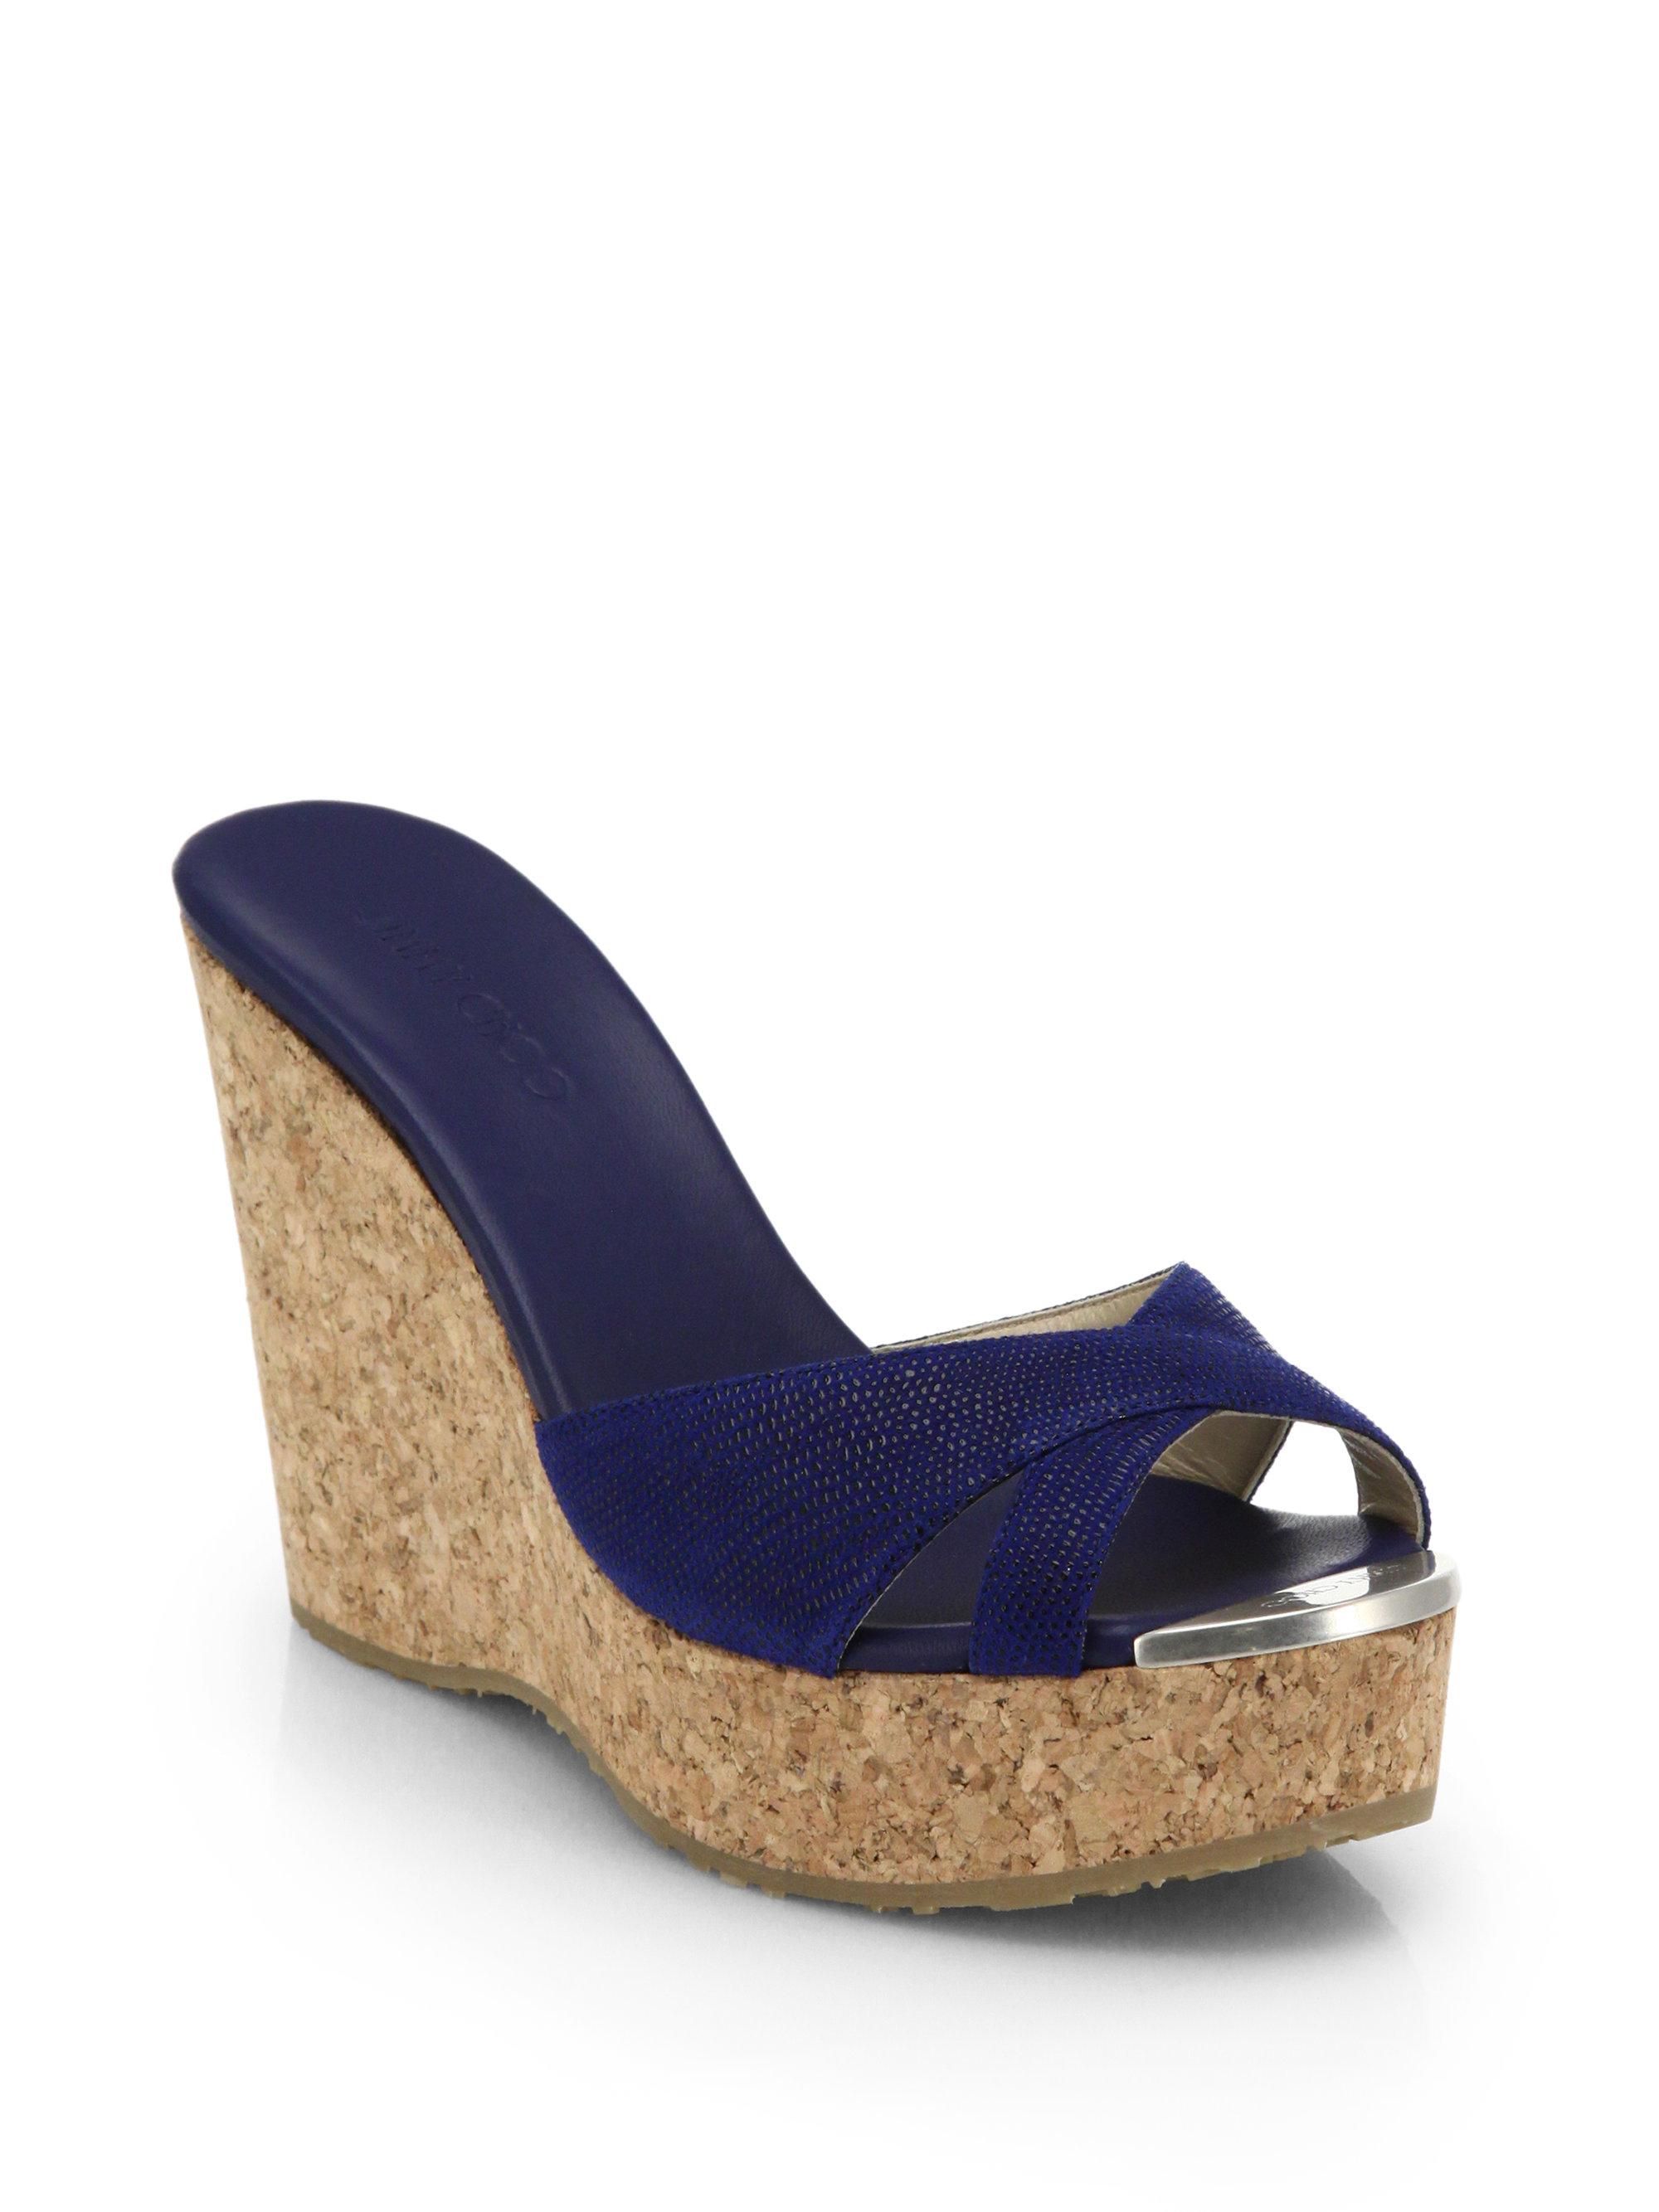 jimmy choo cork sandals for sale louboutinclearance